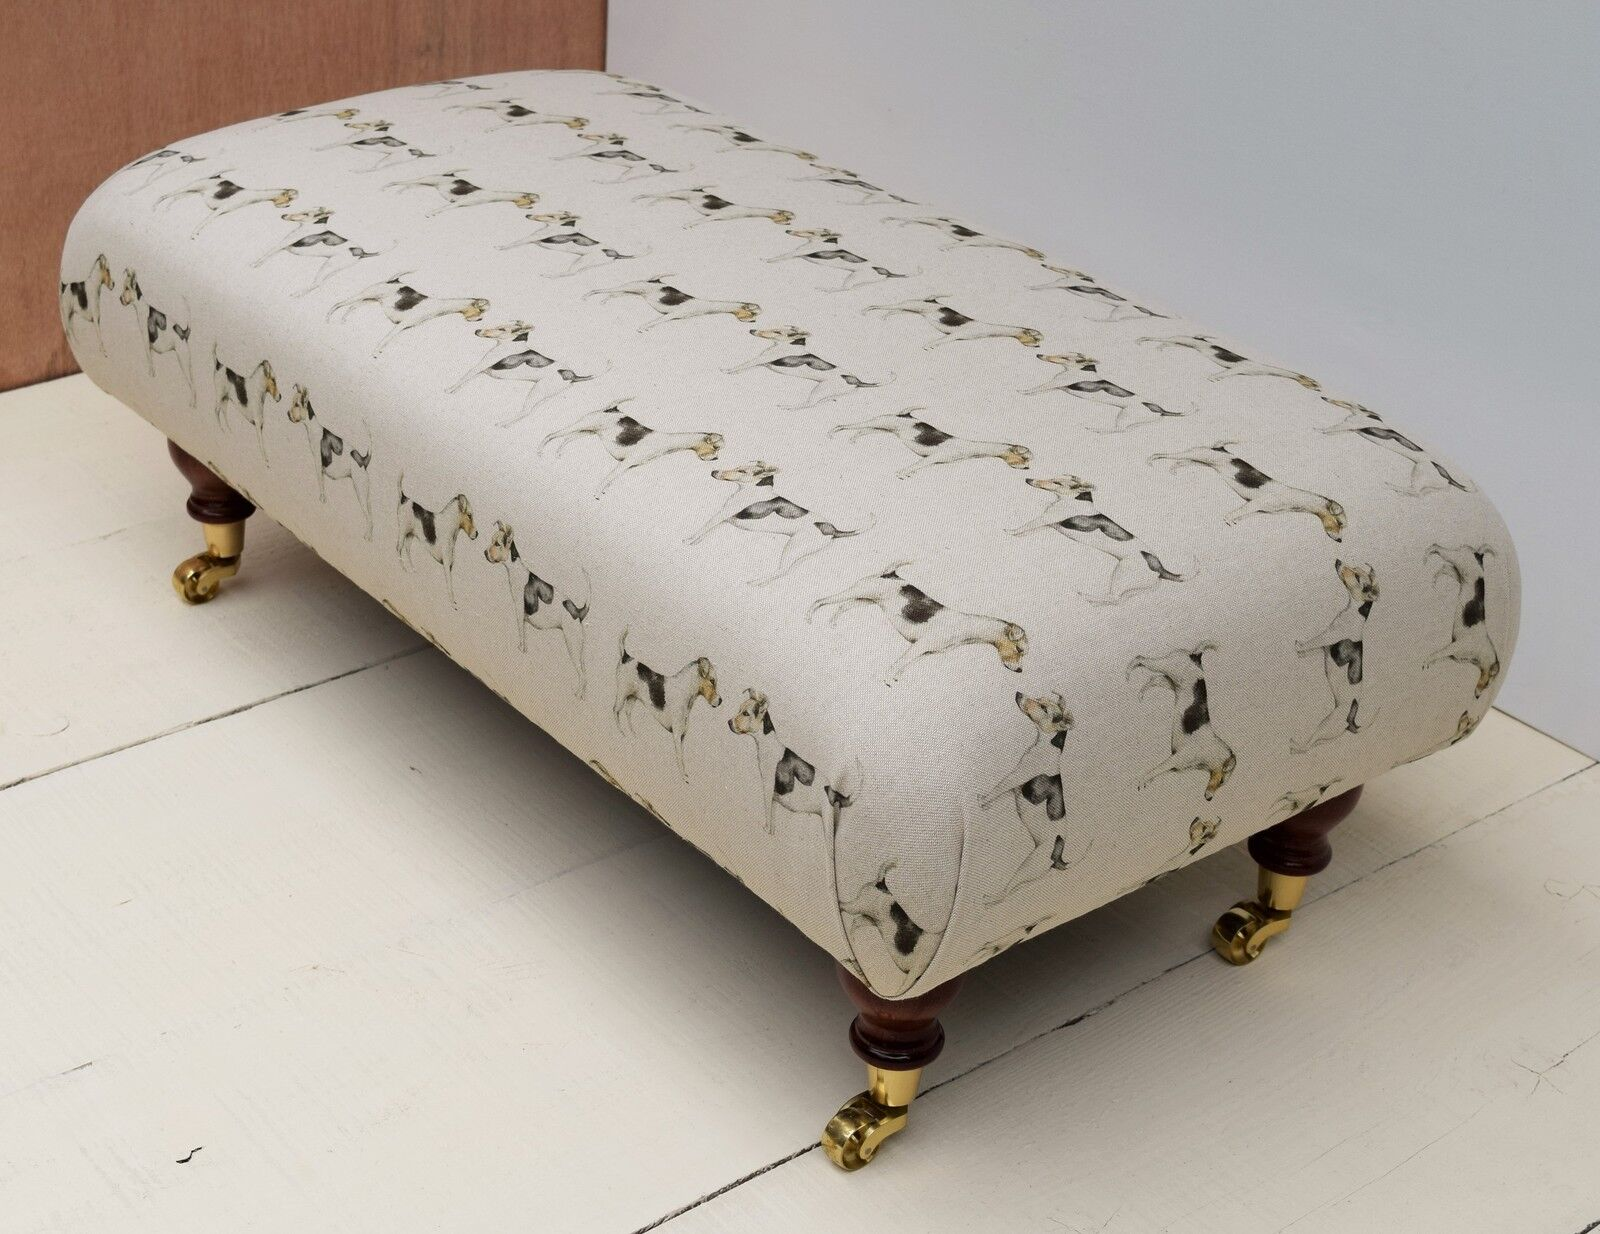 New Large Footstool - Voyage Animal Fabrics. Choice of 18 Fabrics, Legs & Größes